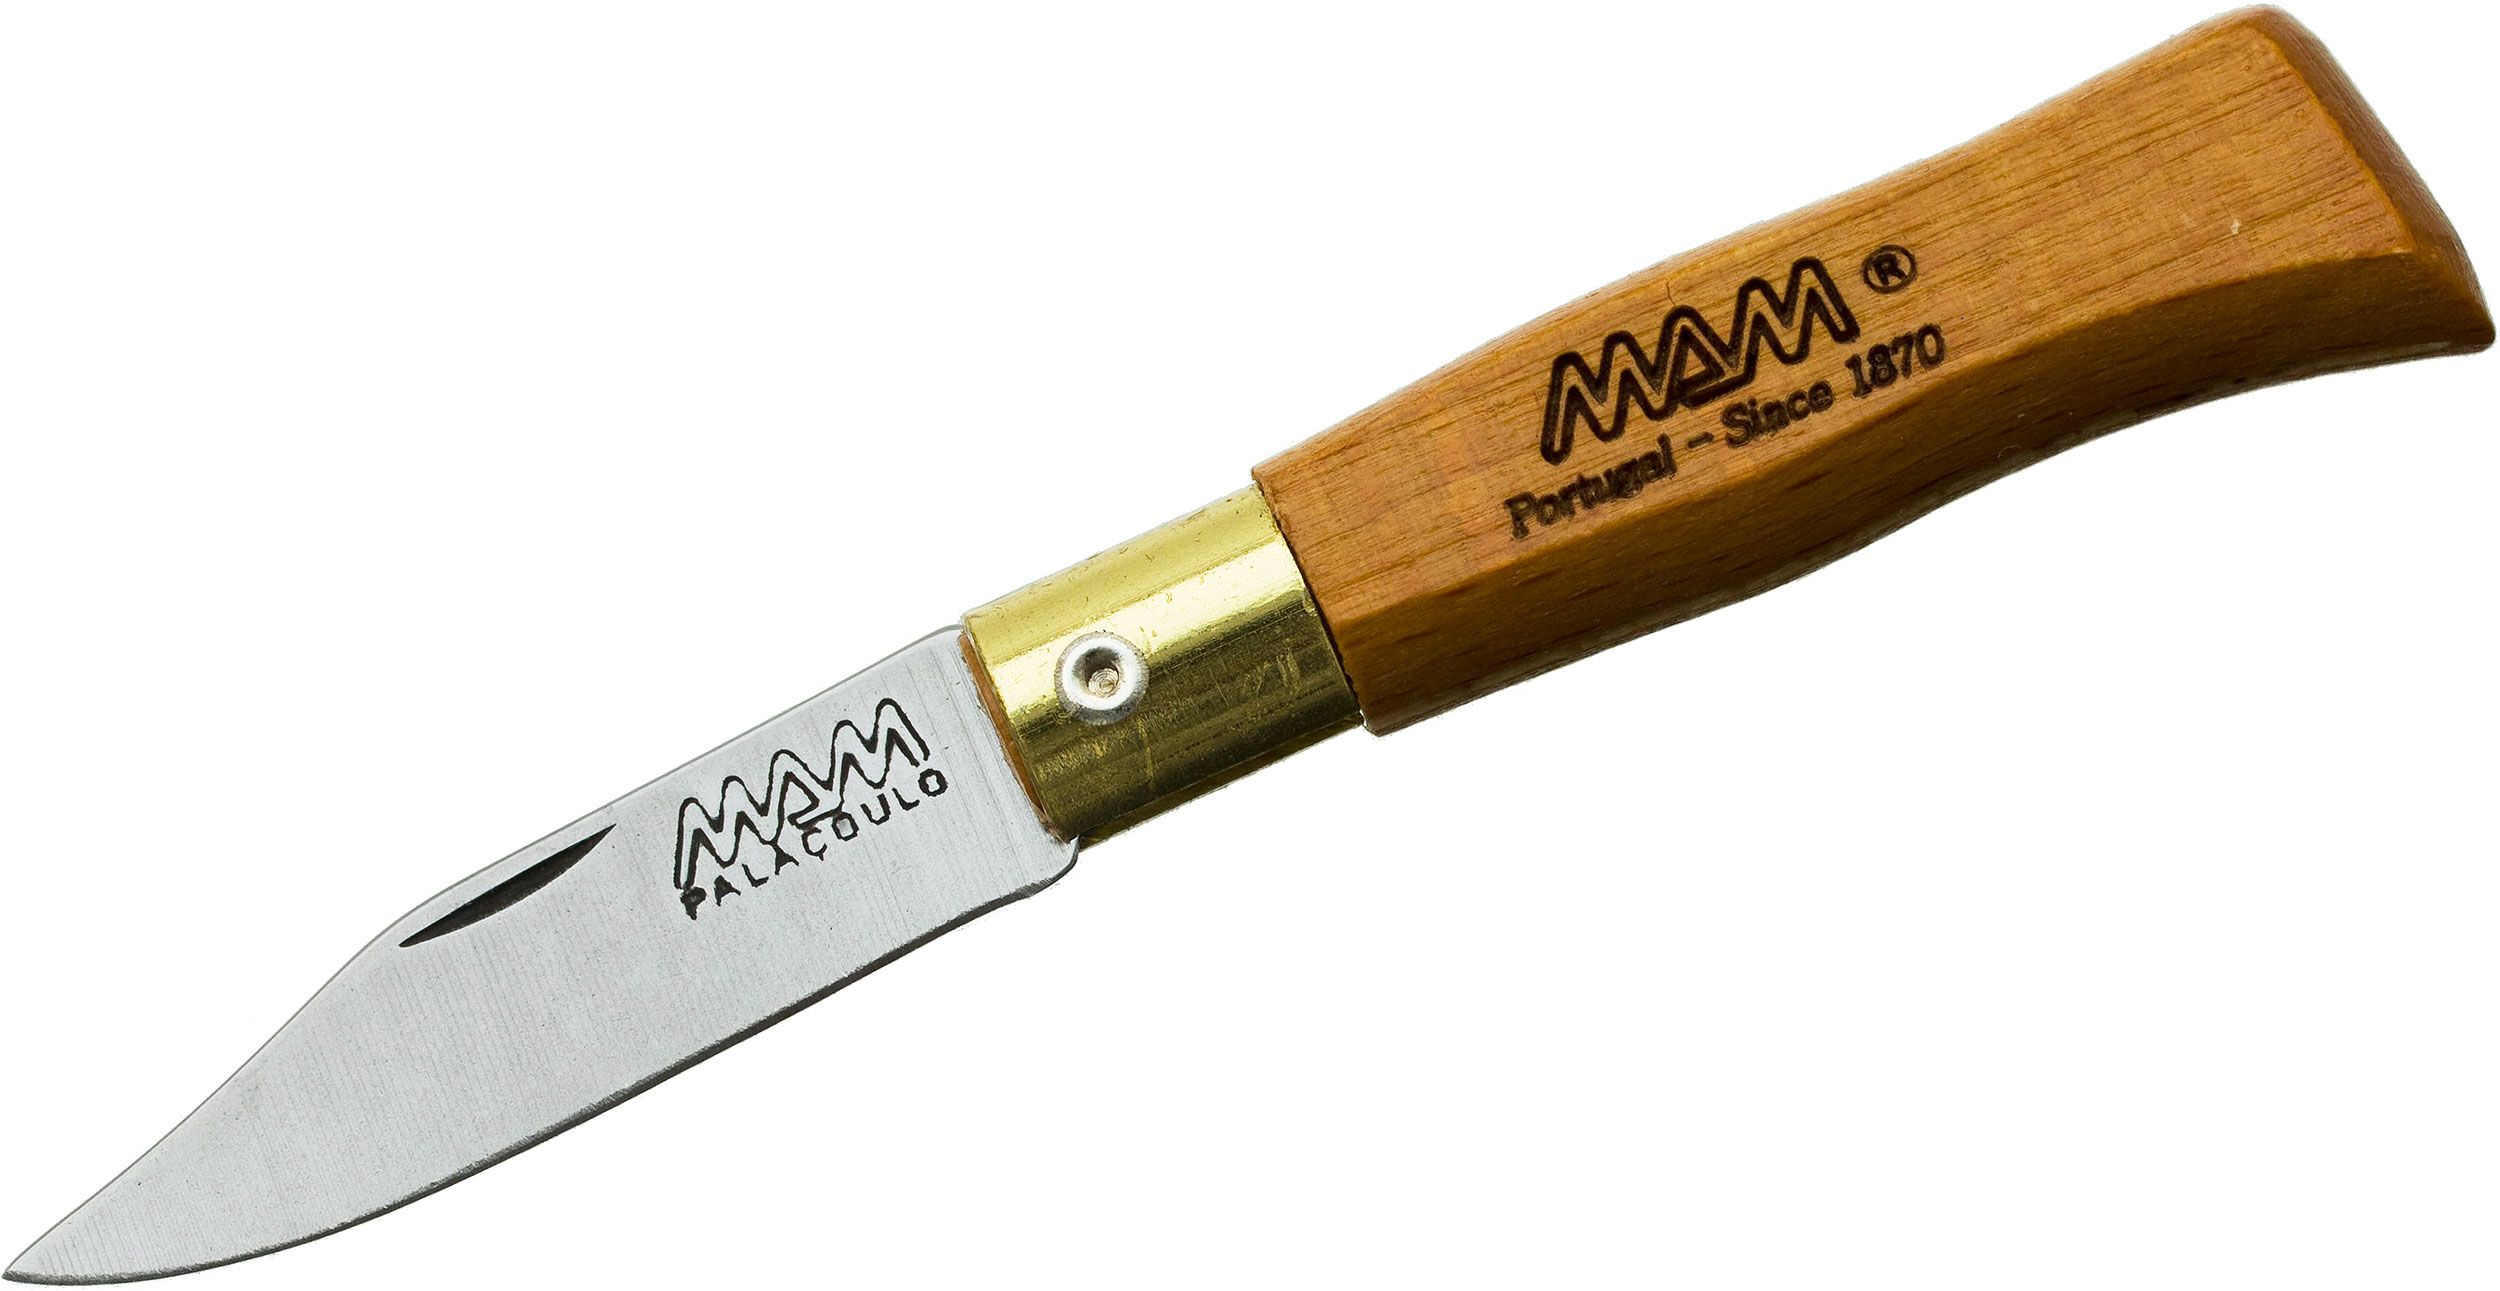 MAM Filmam 2002L Duoro Folding Key Ring Knife 1.625 inch Clip Point Blade, Beechwood Handle, Leather Sheath